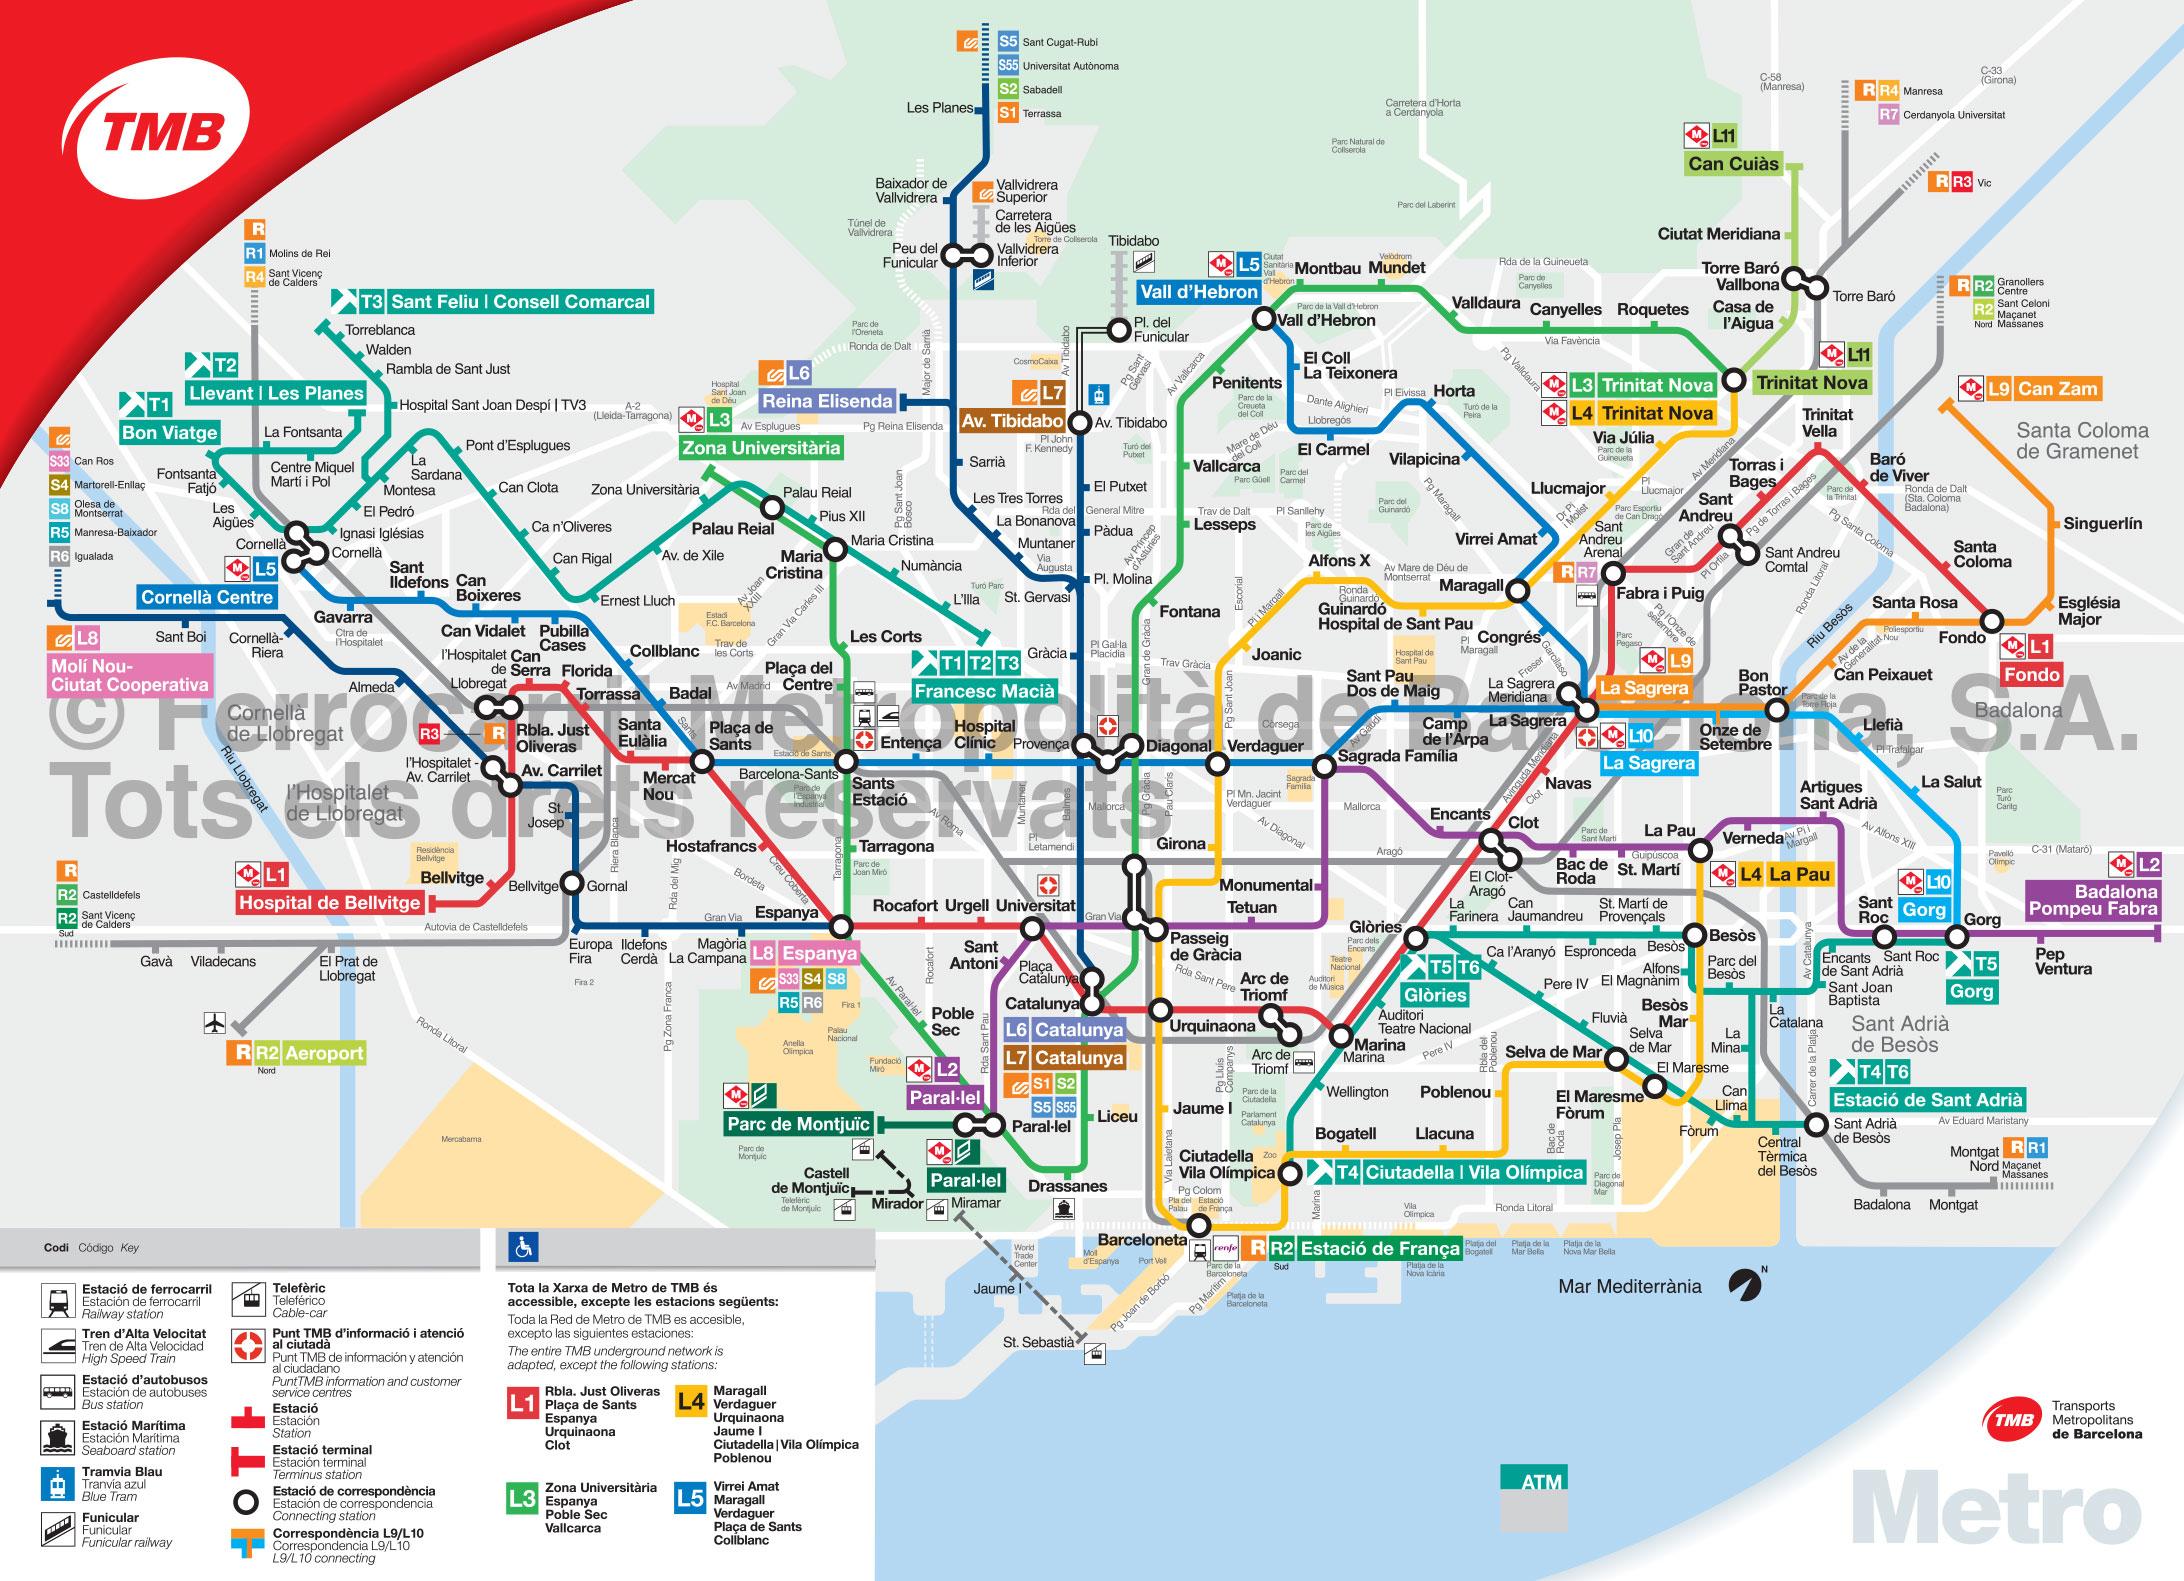 Map Of Barcelona Subway, Underground & Tube (Metro): Stations & Lines - Metro Map Barcelona Printable